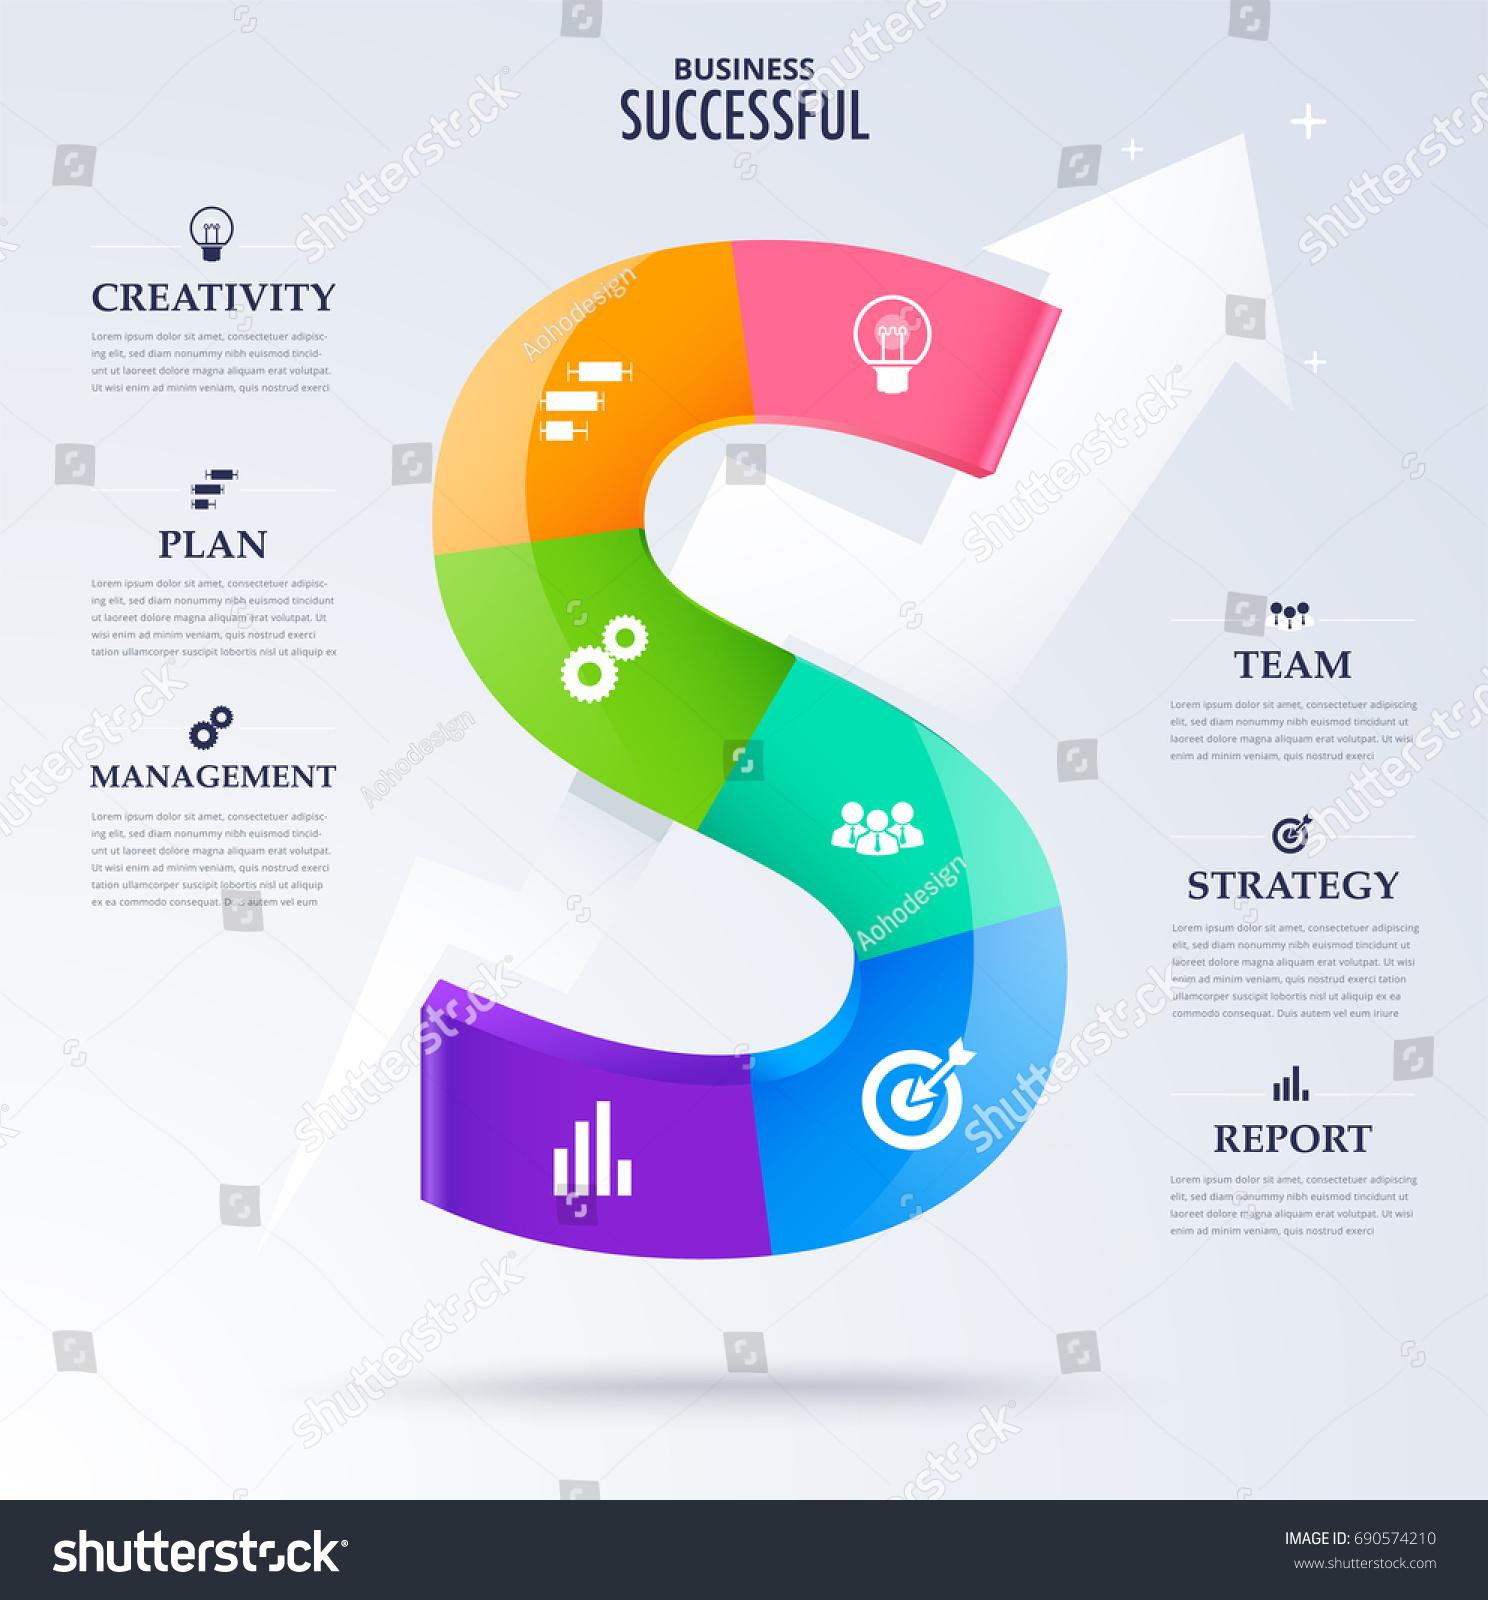 Infographic business successful concept character word stock infographic business successful concept character word s for success concept vector diagram ccuart Images